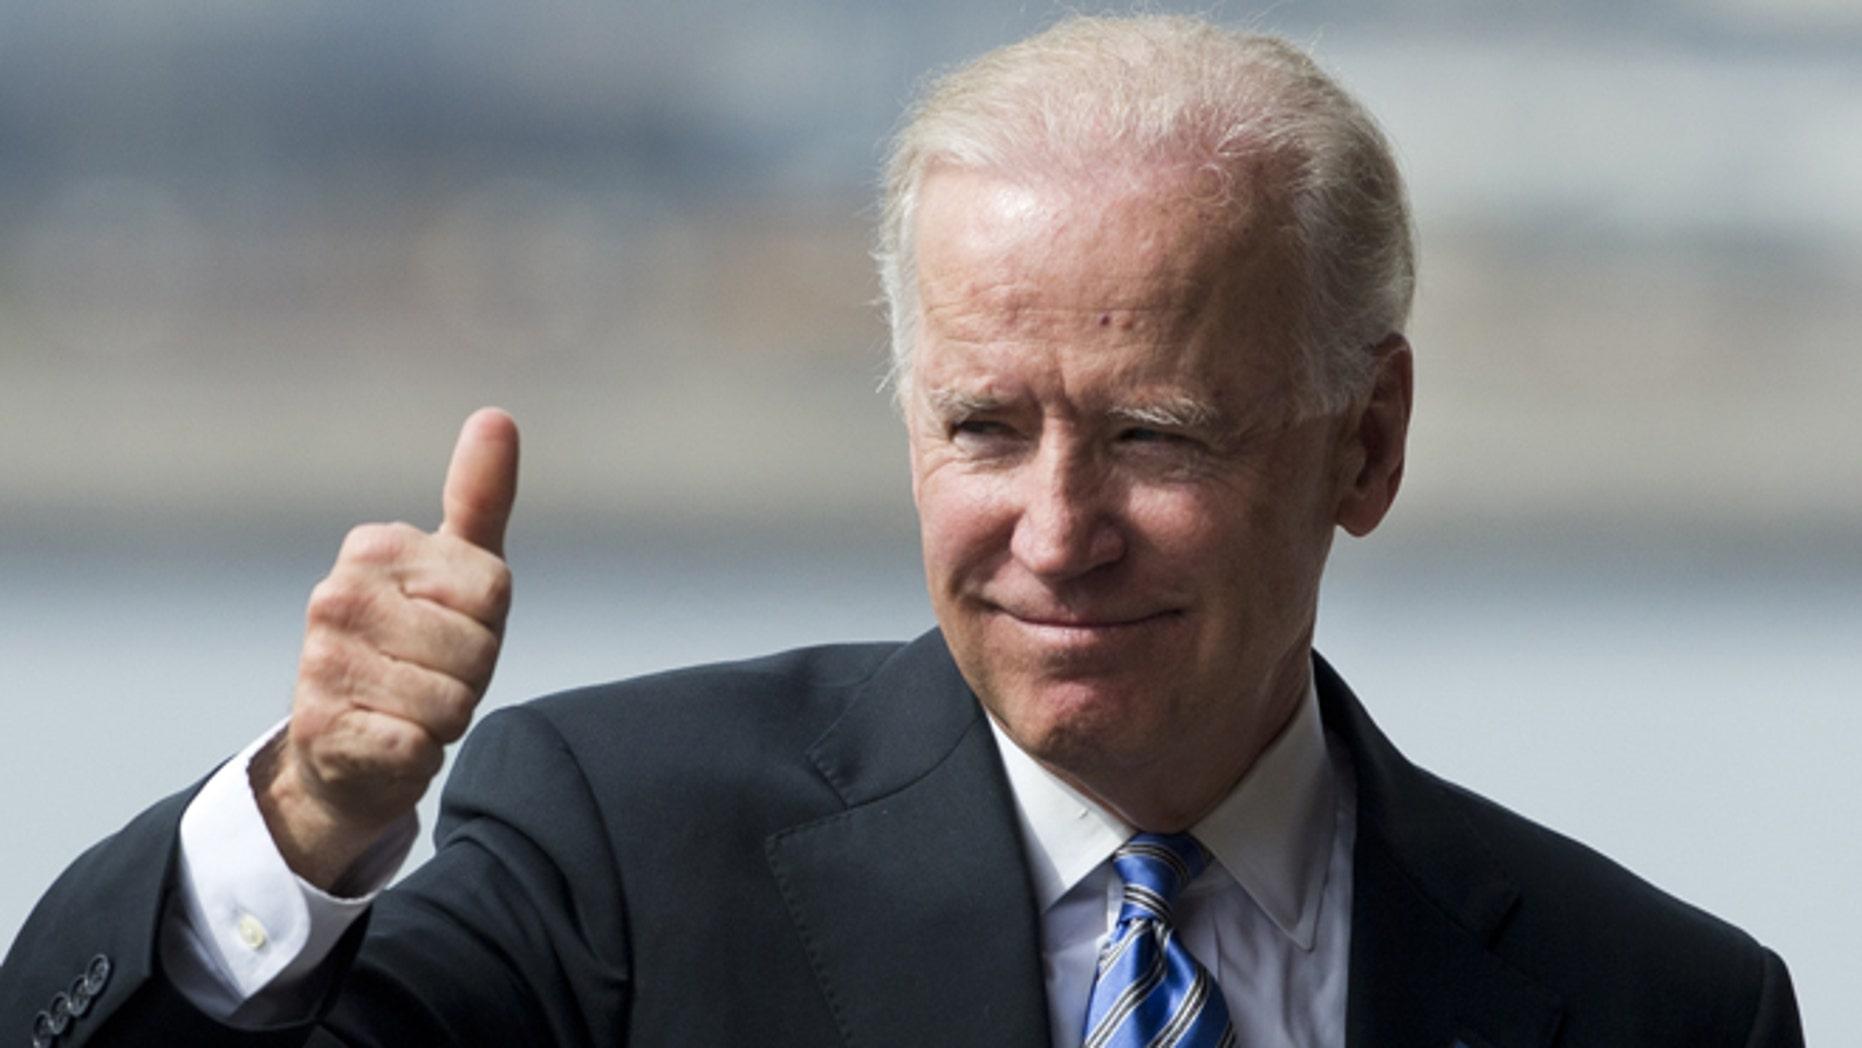 U.S. Vice President Joe Biden gives a thumbs up after giving a speech in Rio de Janeiro, Brazil, Wednesday, May 29, 2013.